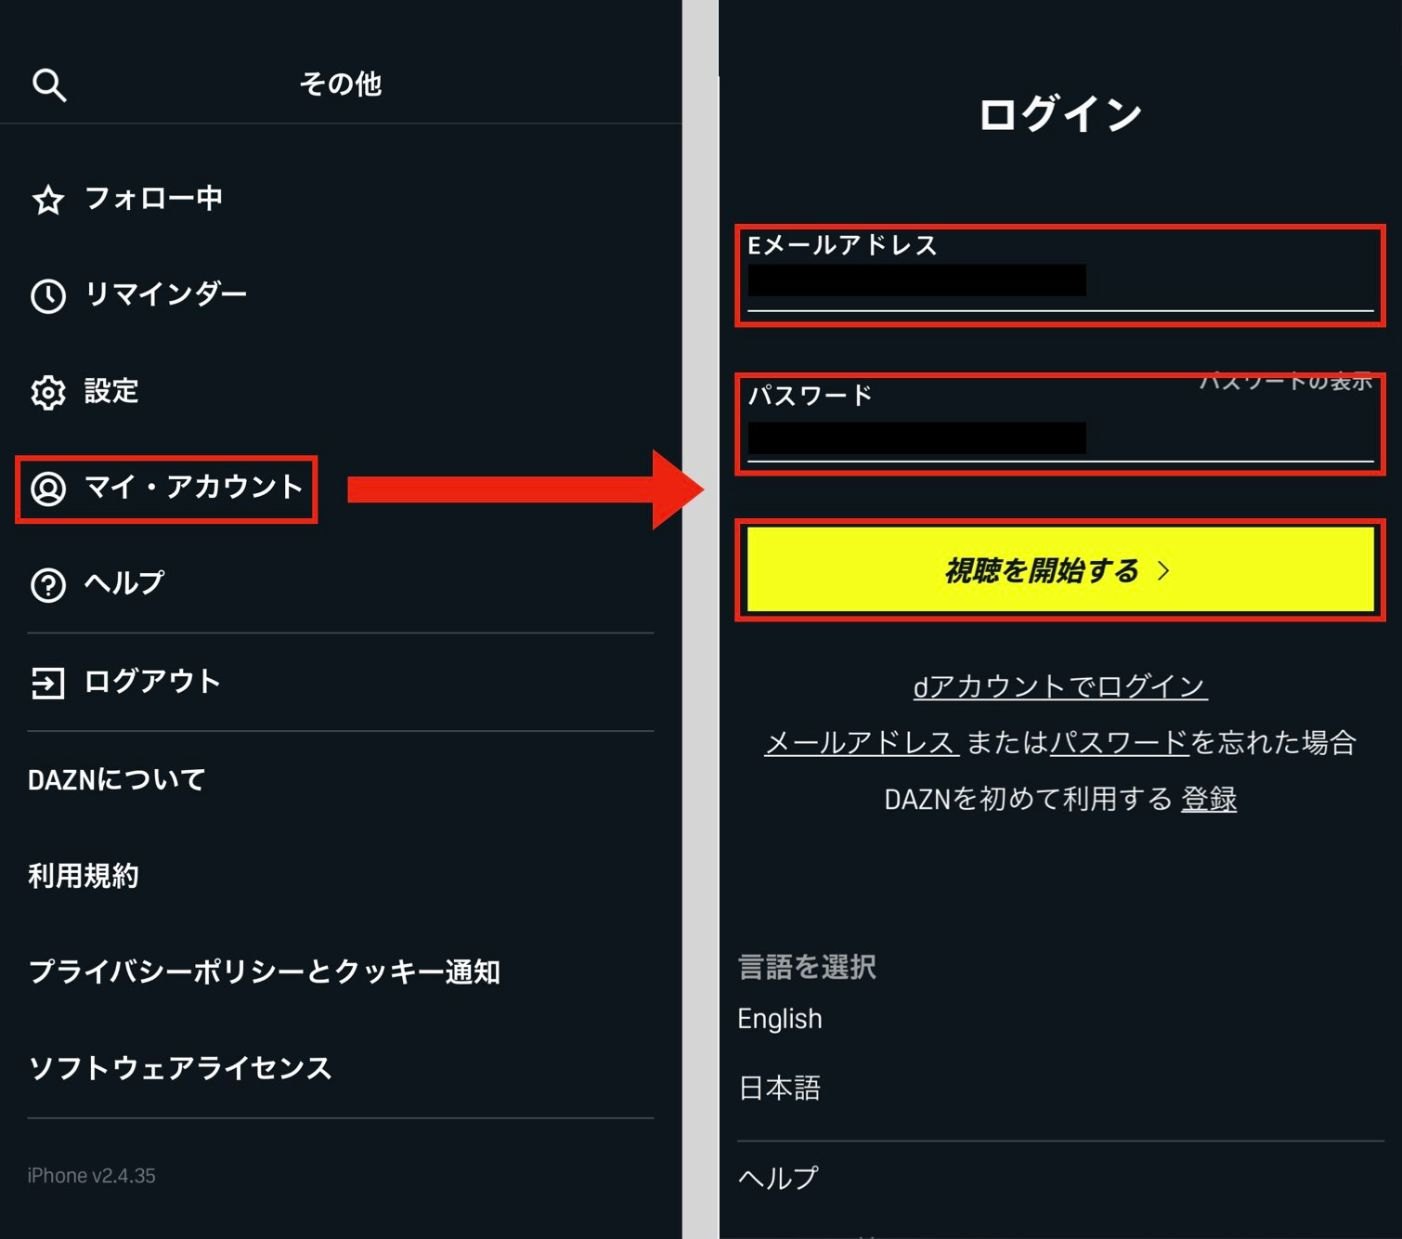 【Webブラウザ・スマートテレビ・ゲーム端末の場合の解約手順2】マイ・アカウントを選択してログイン